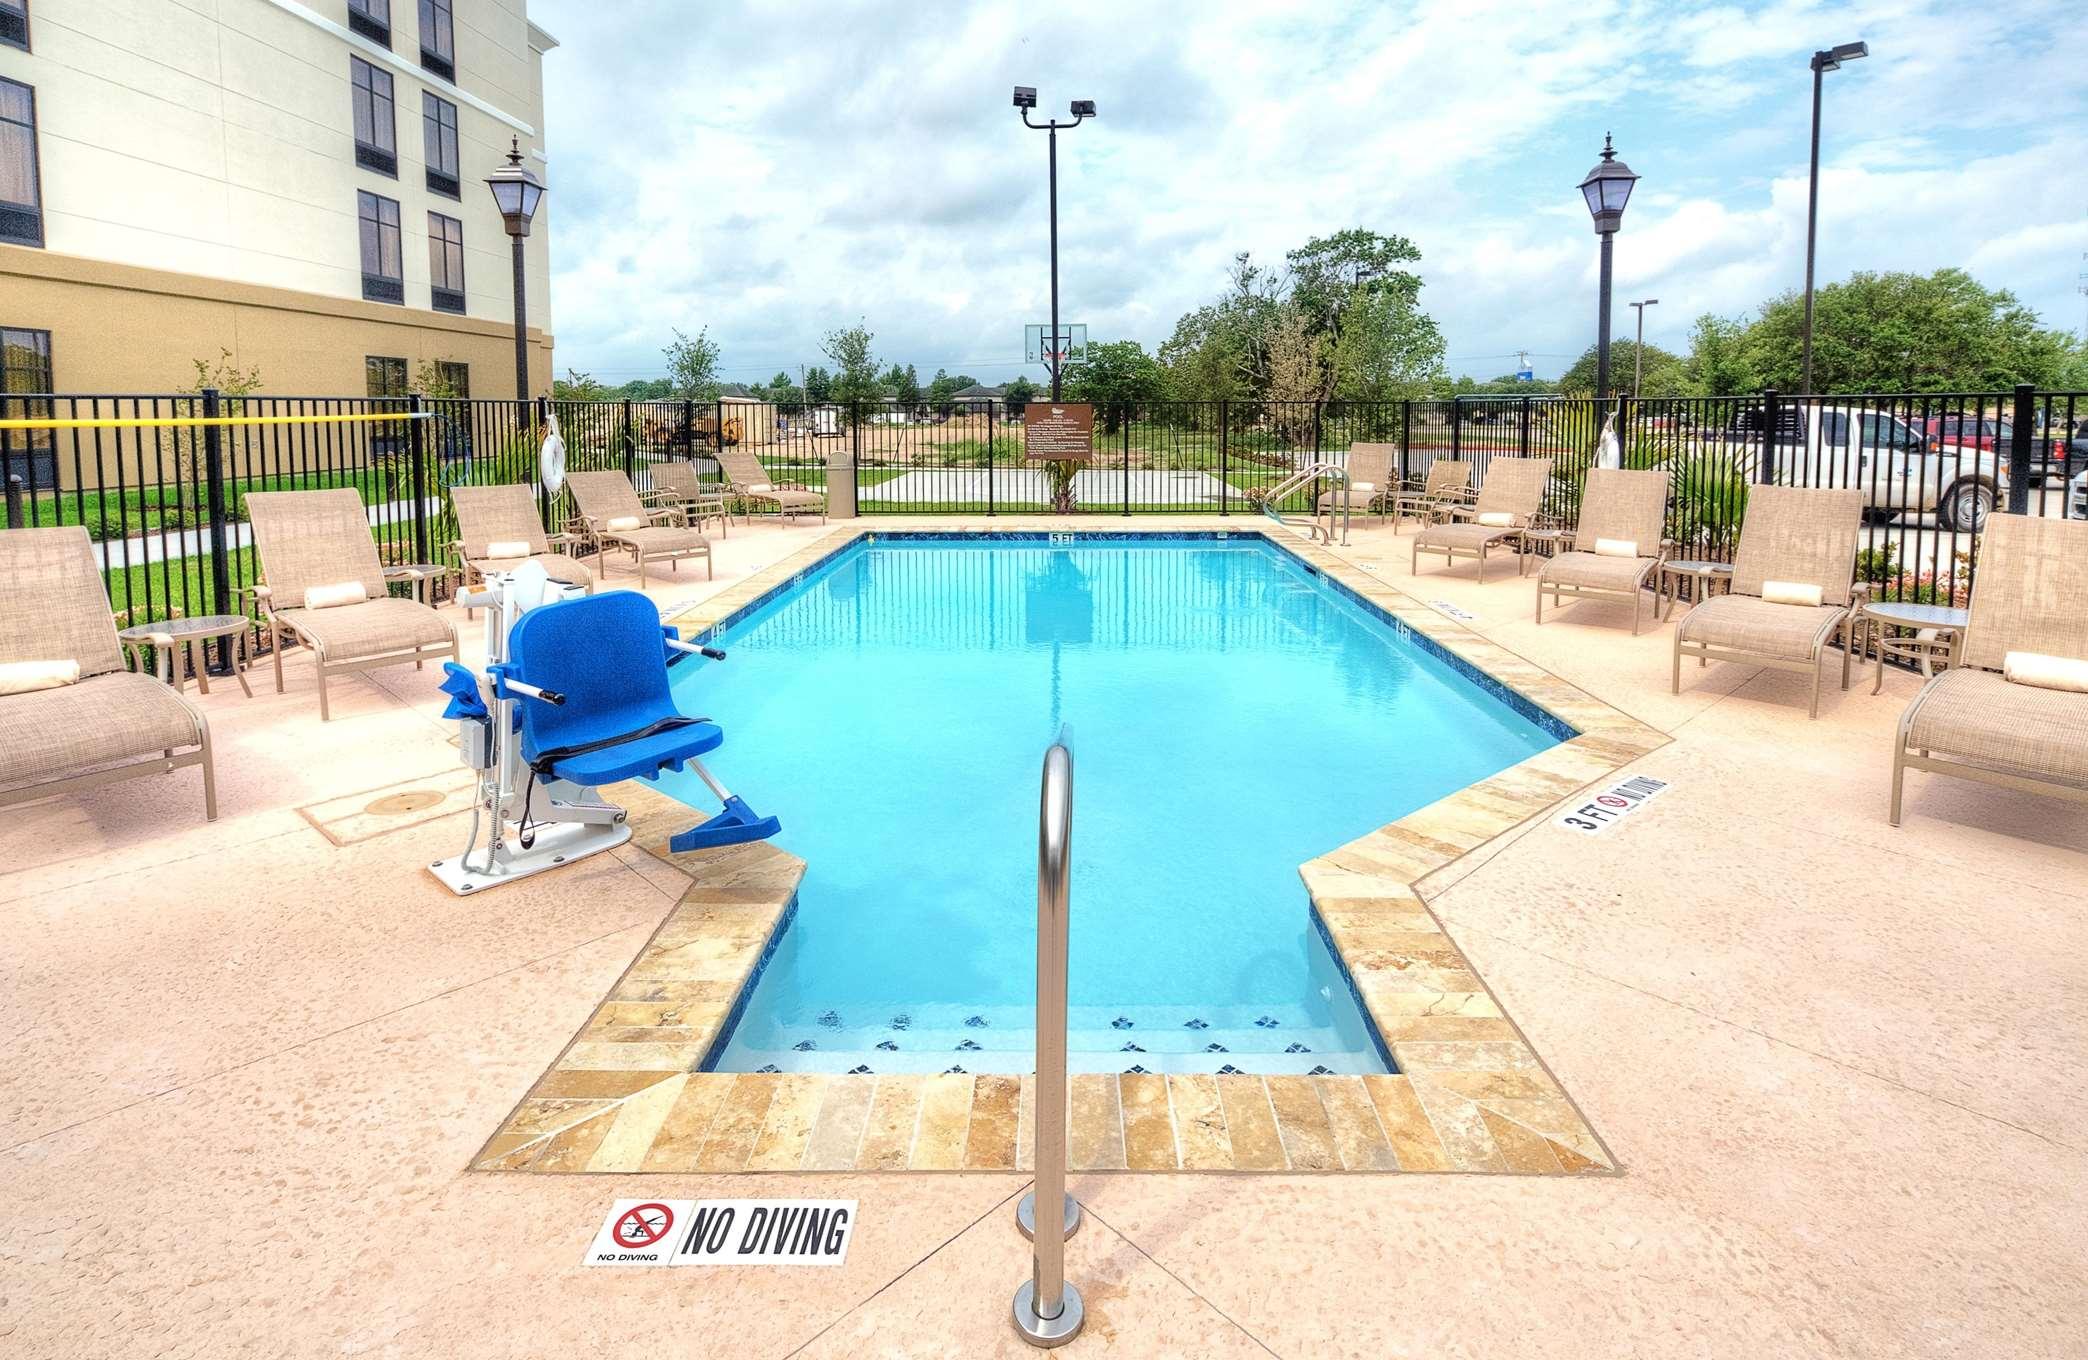 Homewood Suites by Hilton Victoria, TX image 7